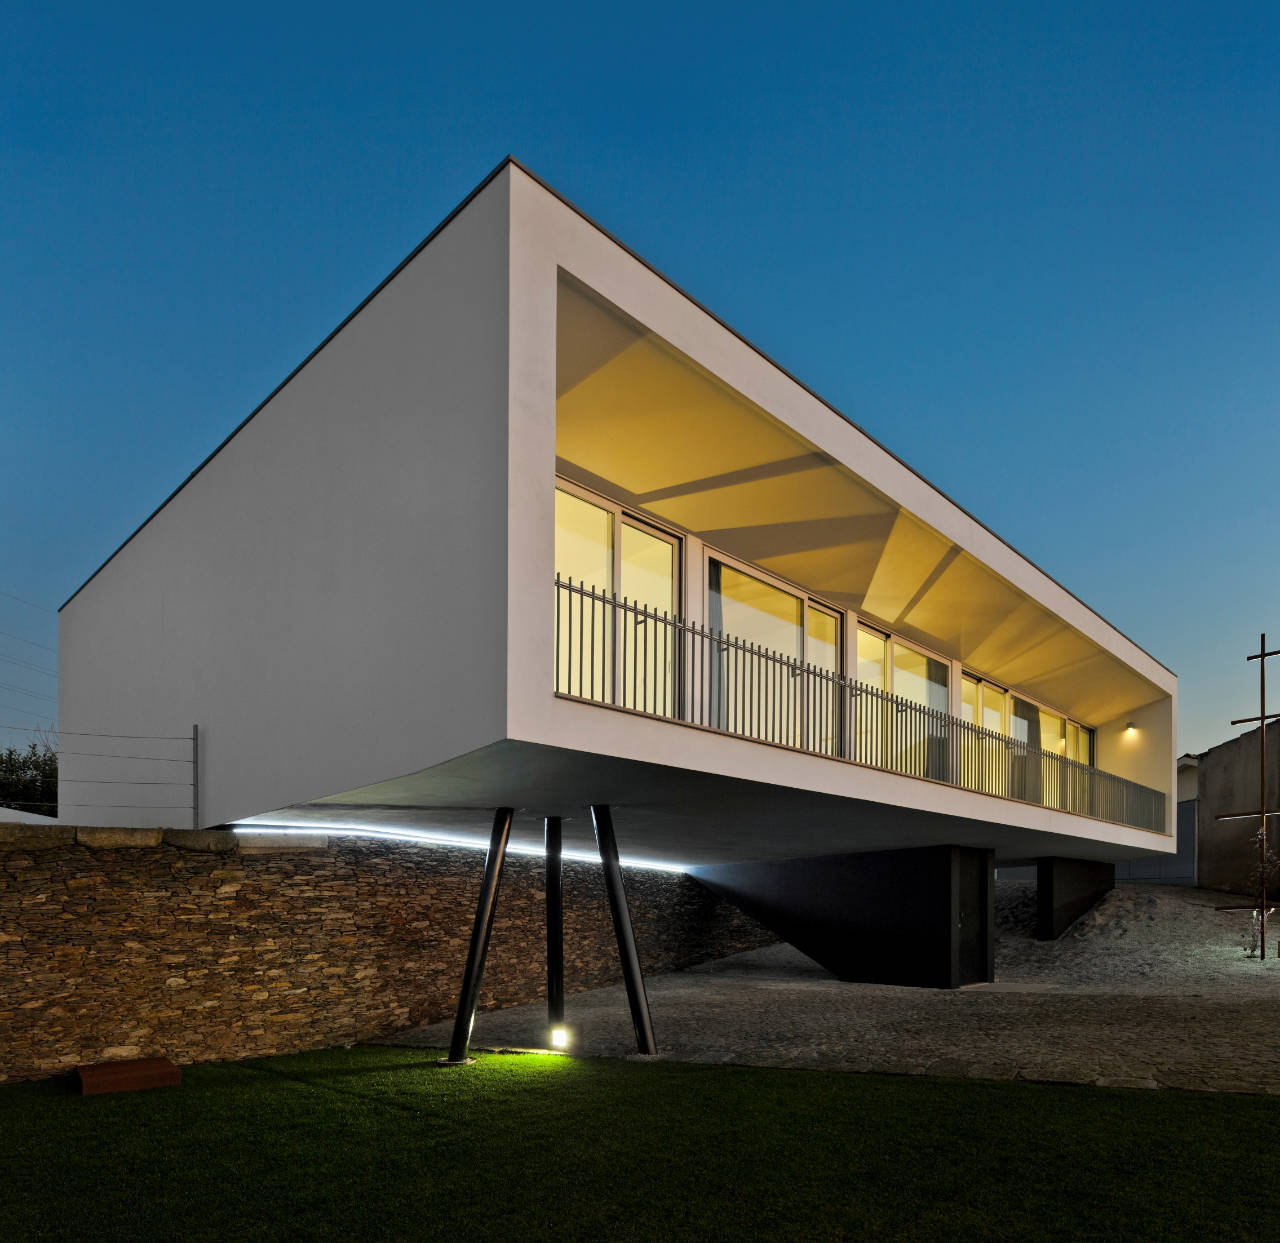 House In Sobral / Nelson Resende, © FG+SG - Fotografia de Arquitectura